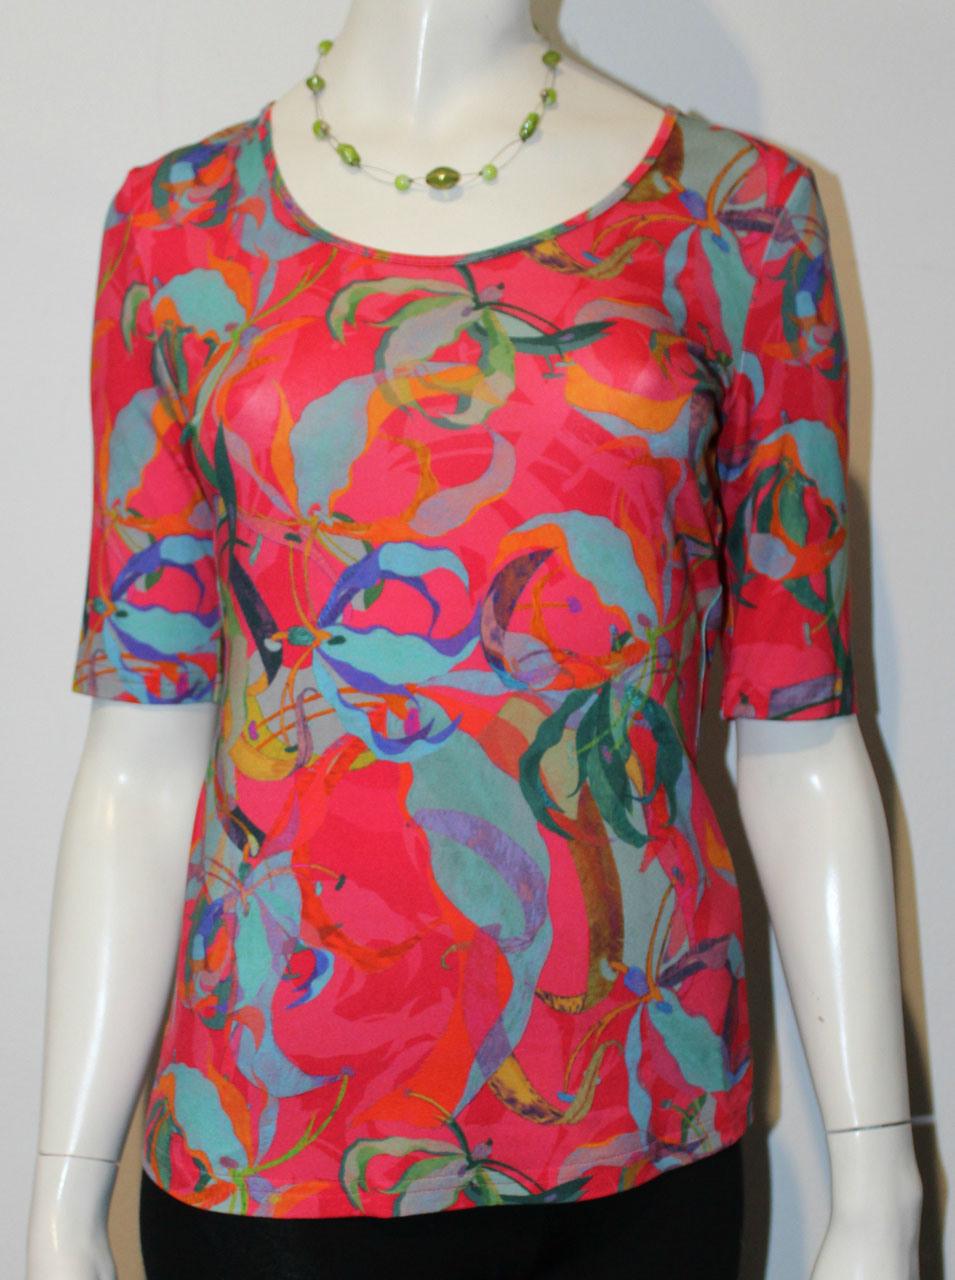 Fox´s Mode Shirts  Fox's Kleider Baby Alpaka Invero